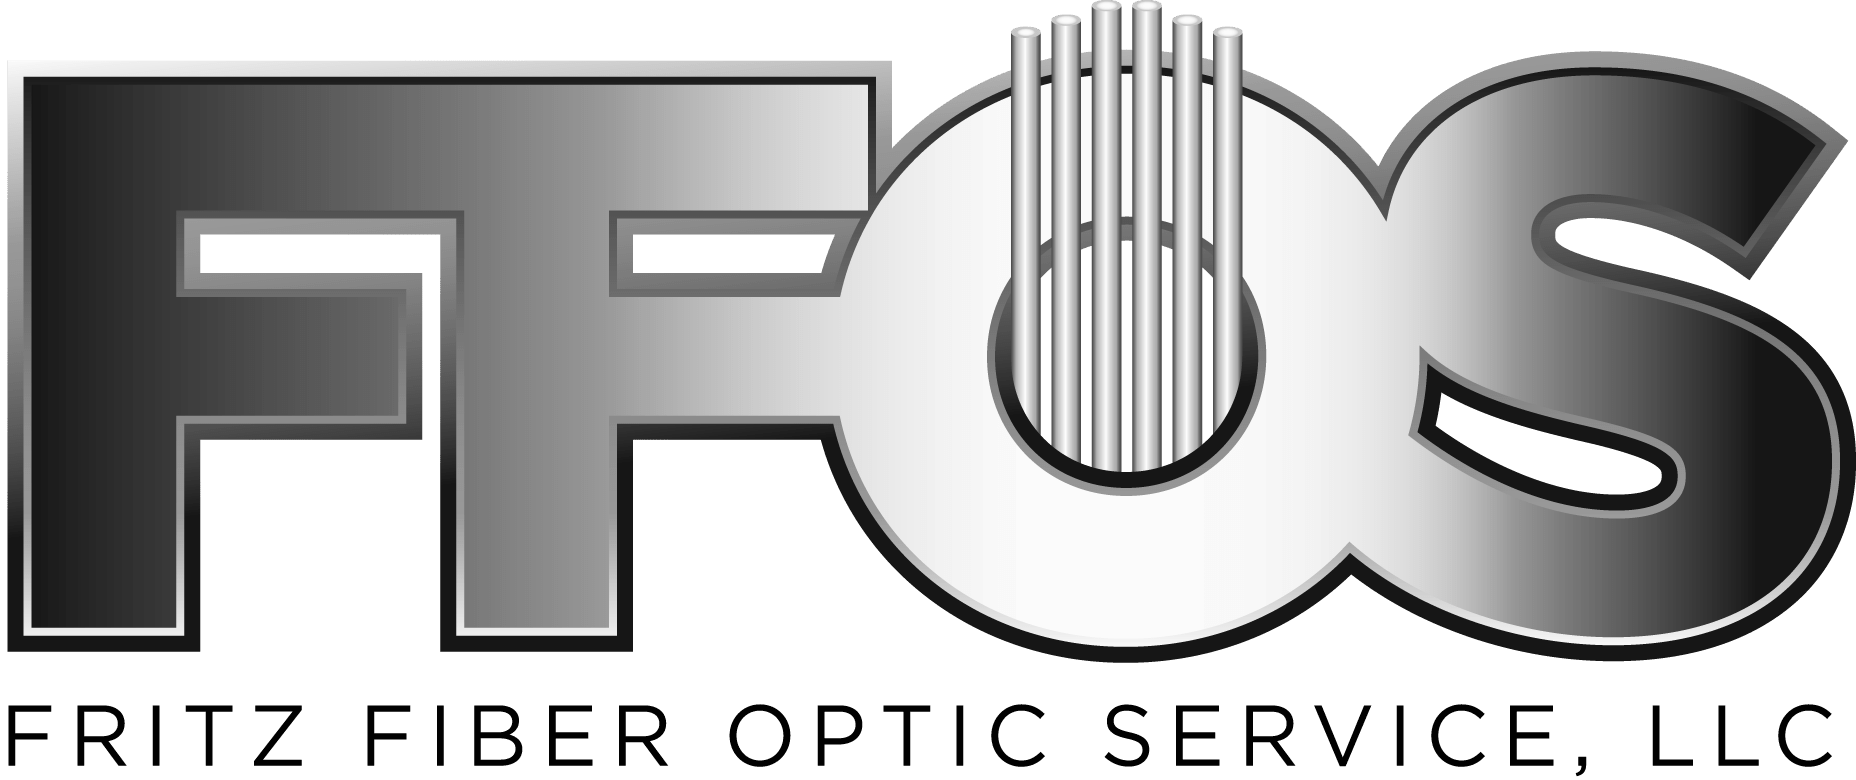 Fritz  Fiber Optic Service logo